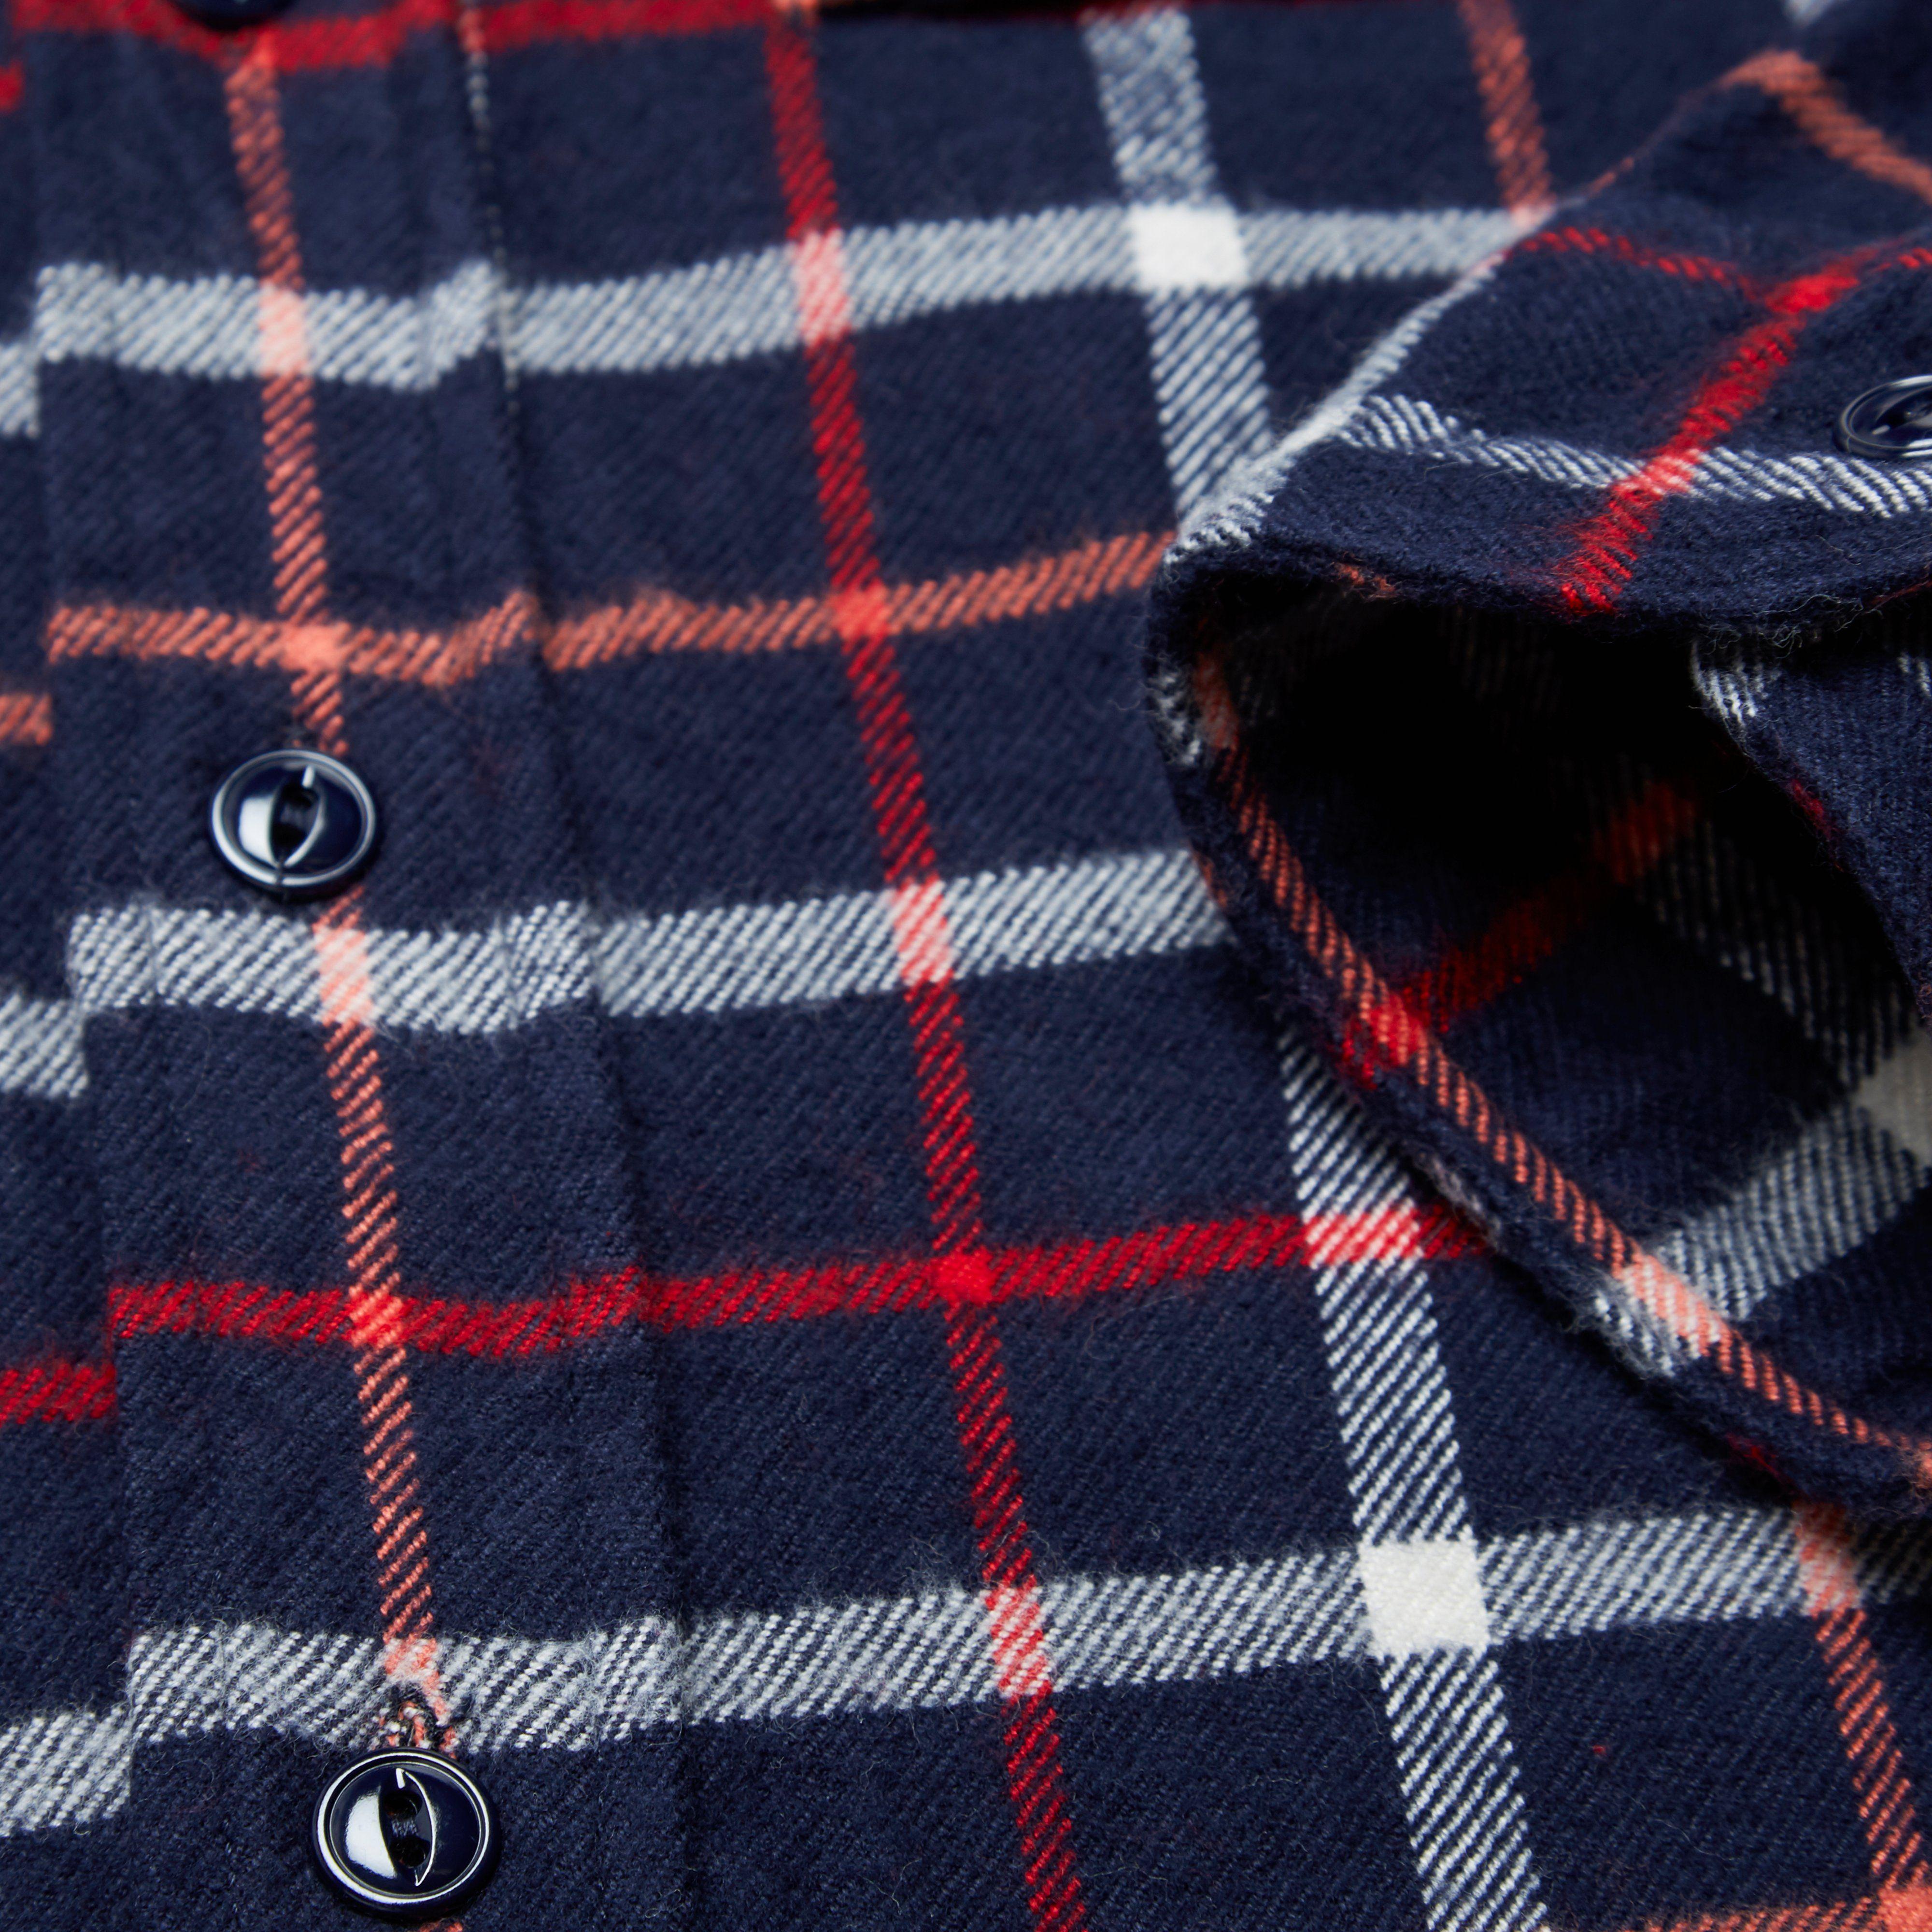 Engineered Garments Work Shirt - Plaid Flannel